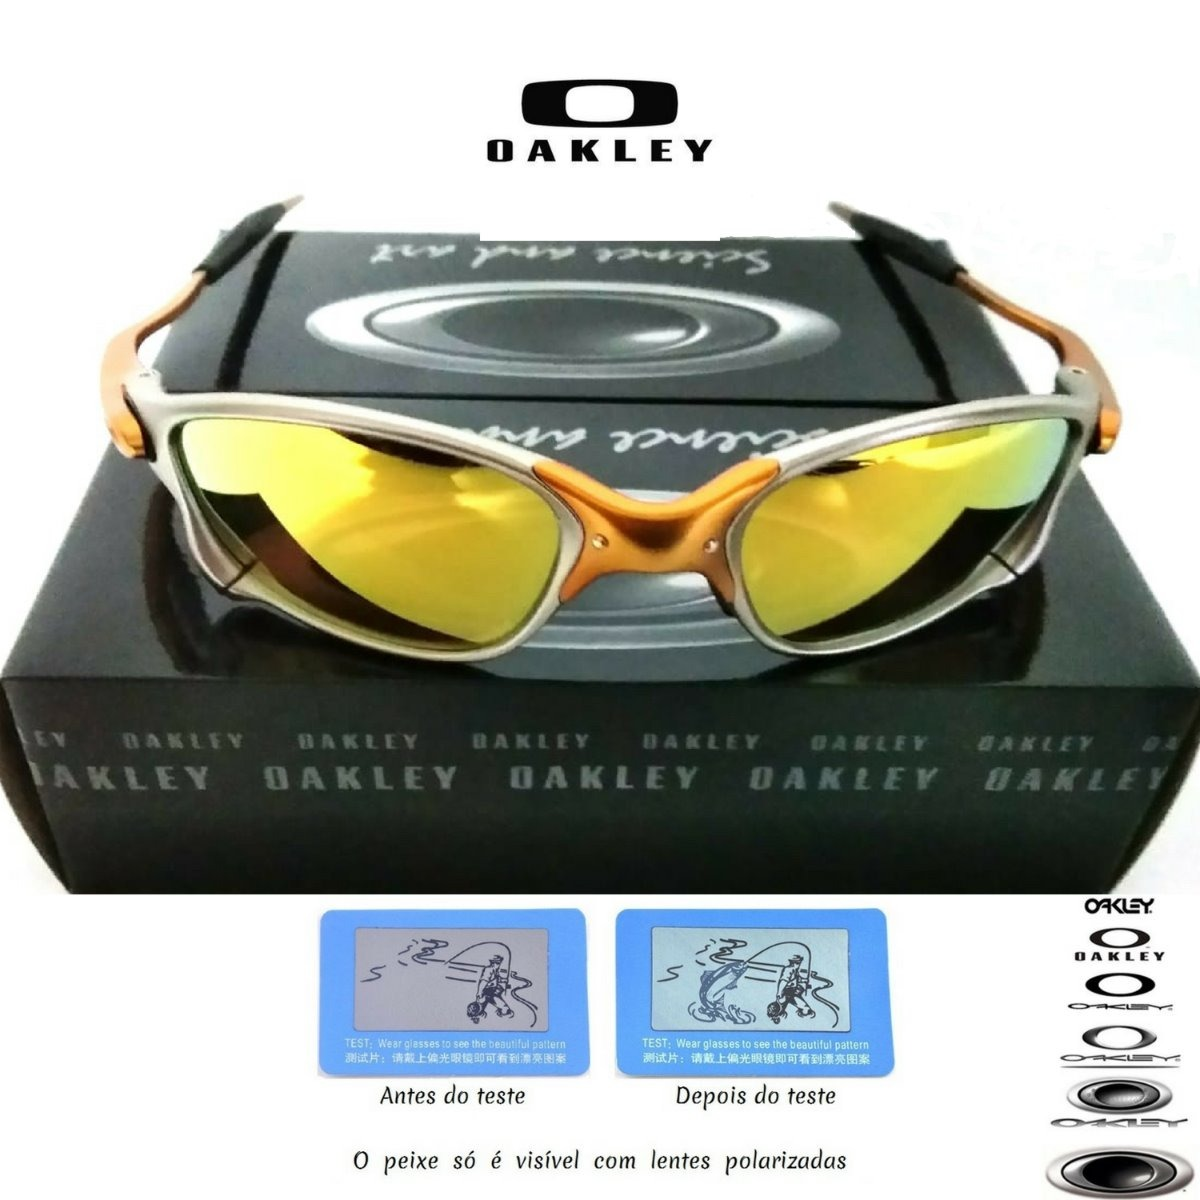 ef7ad3f7184ab Óculos Oakley Double Xx 24k Squared Rubi Juliet Promoção - R  120,00 ...